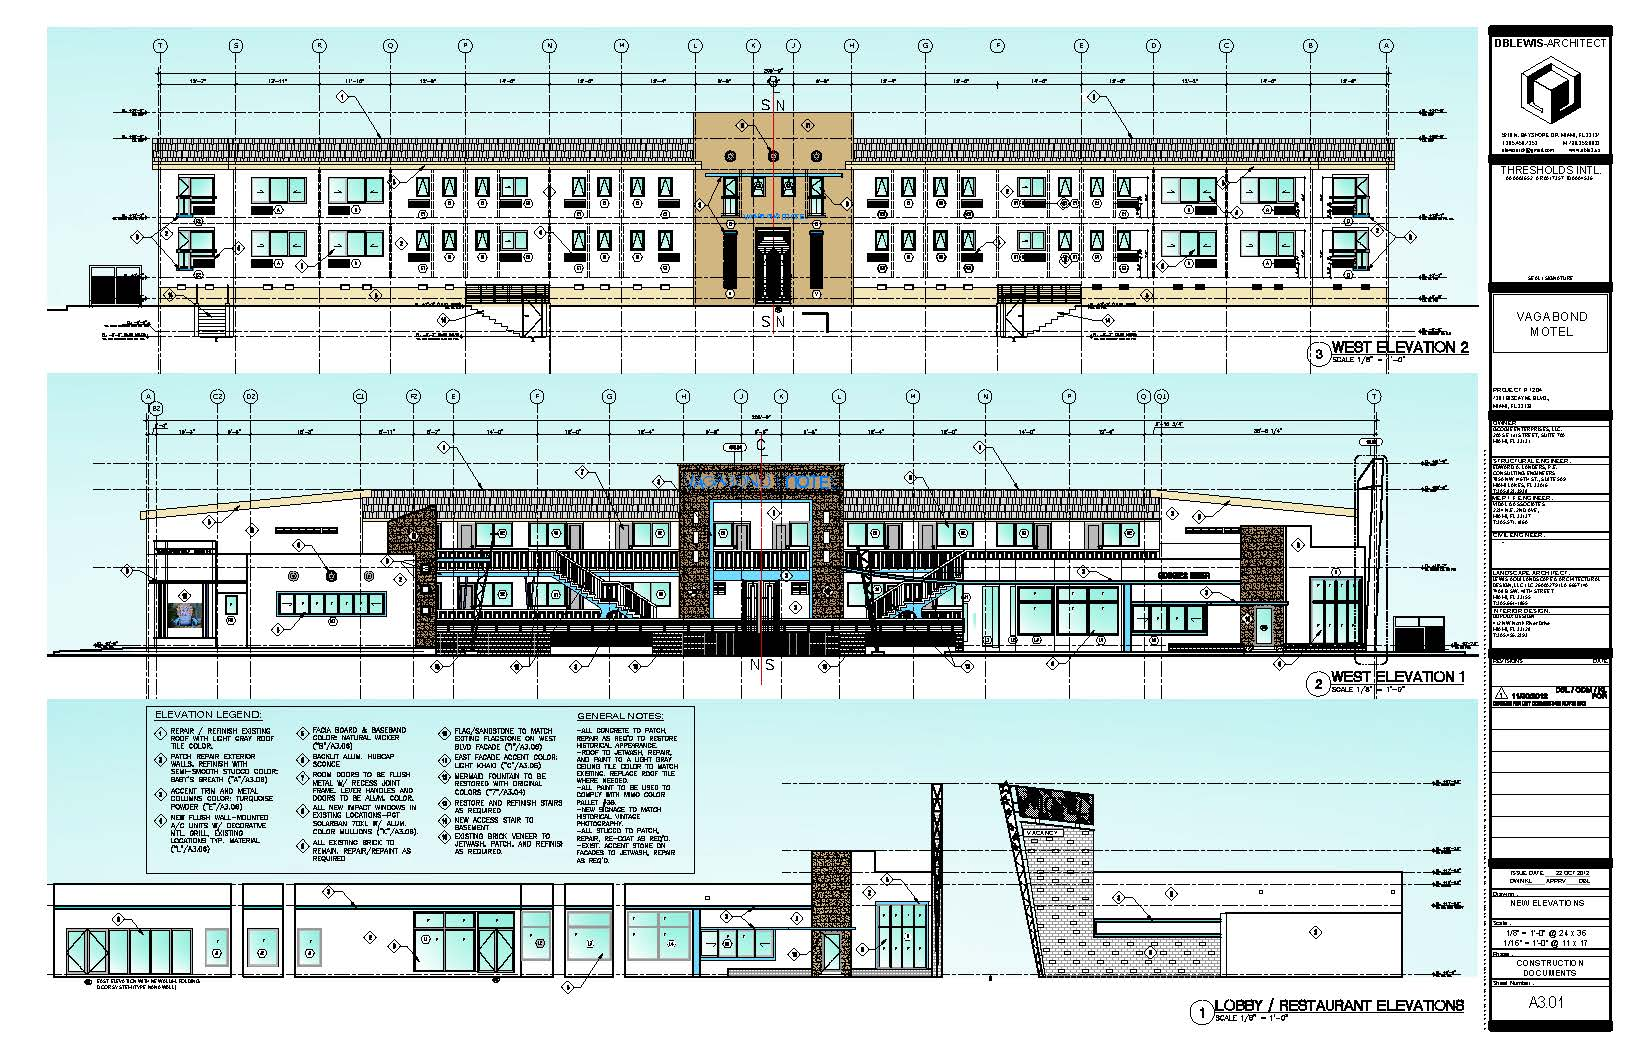 Vagabond Motel. West elevations & lobby-restaurant elevations